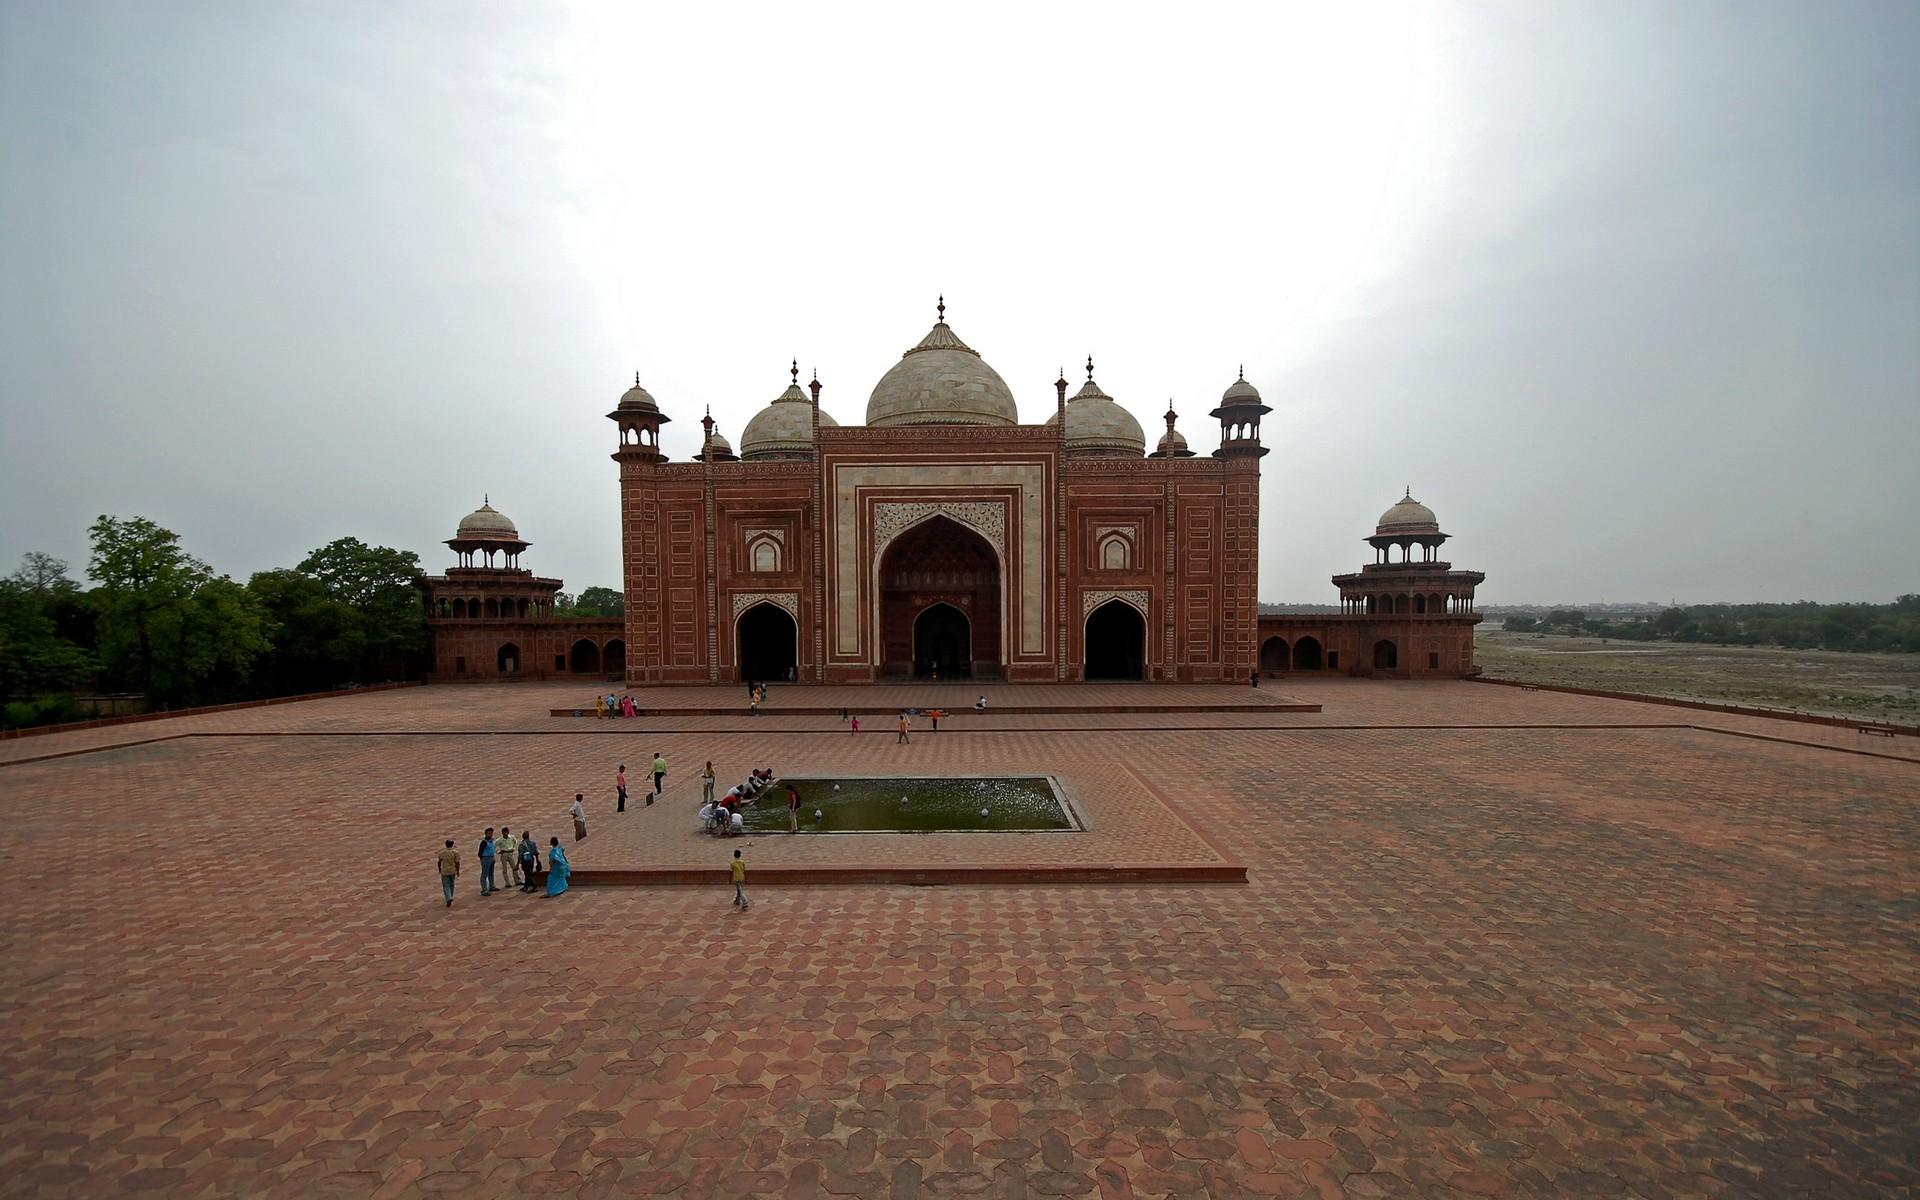 Religioso - Buddhism  - Fotografía - Paisaje - India - Temple - Red Taj - Tourist - Taimahal Fondo de Pantalla